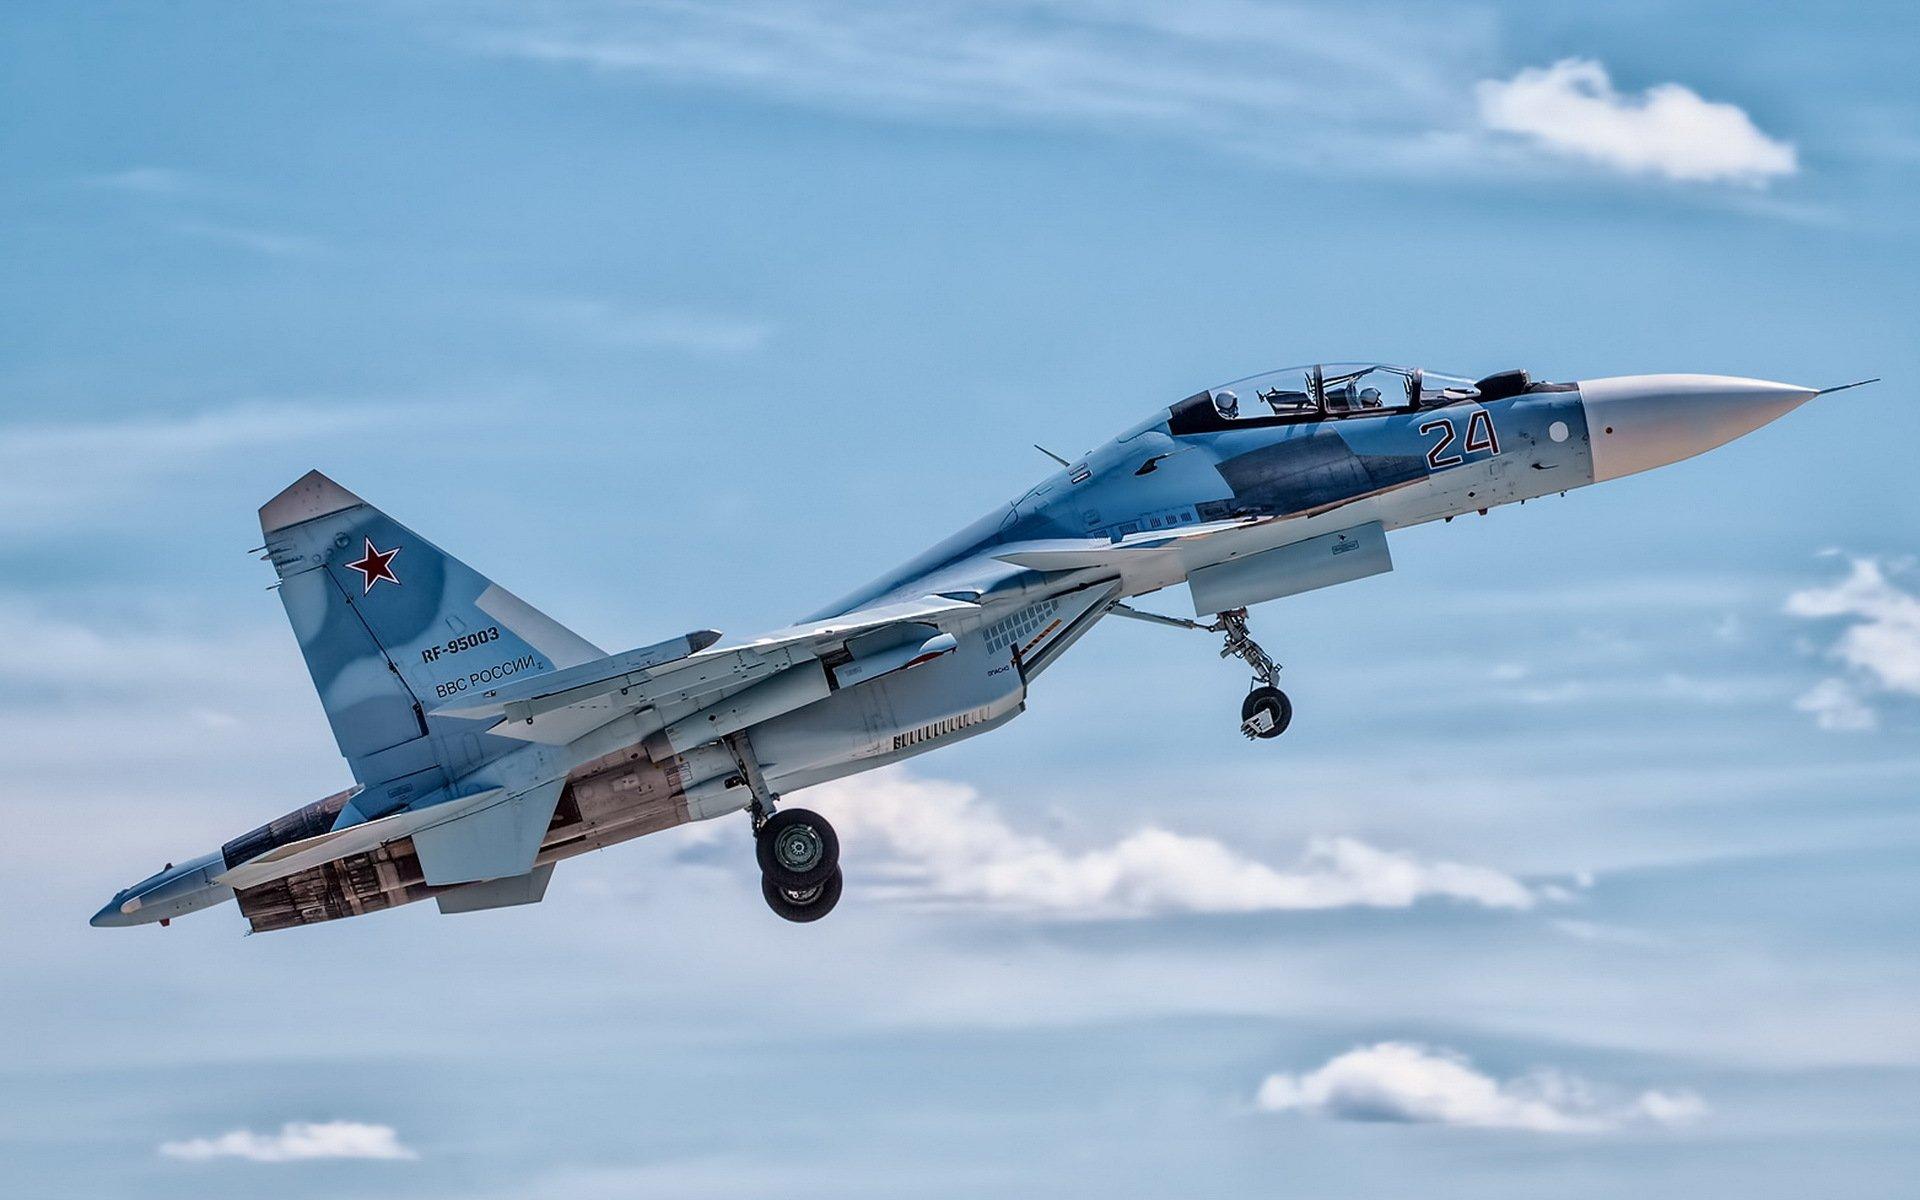 Military - Sukhoi Su-30  Jet Fighter Aircraft Warplane Wallpaper